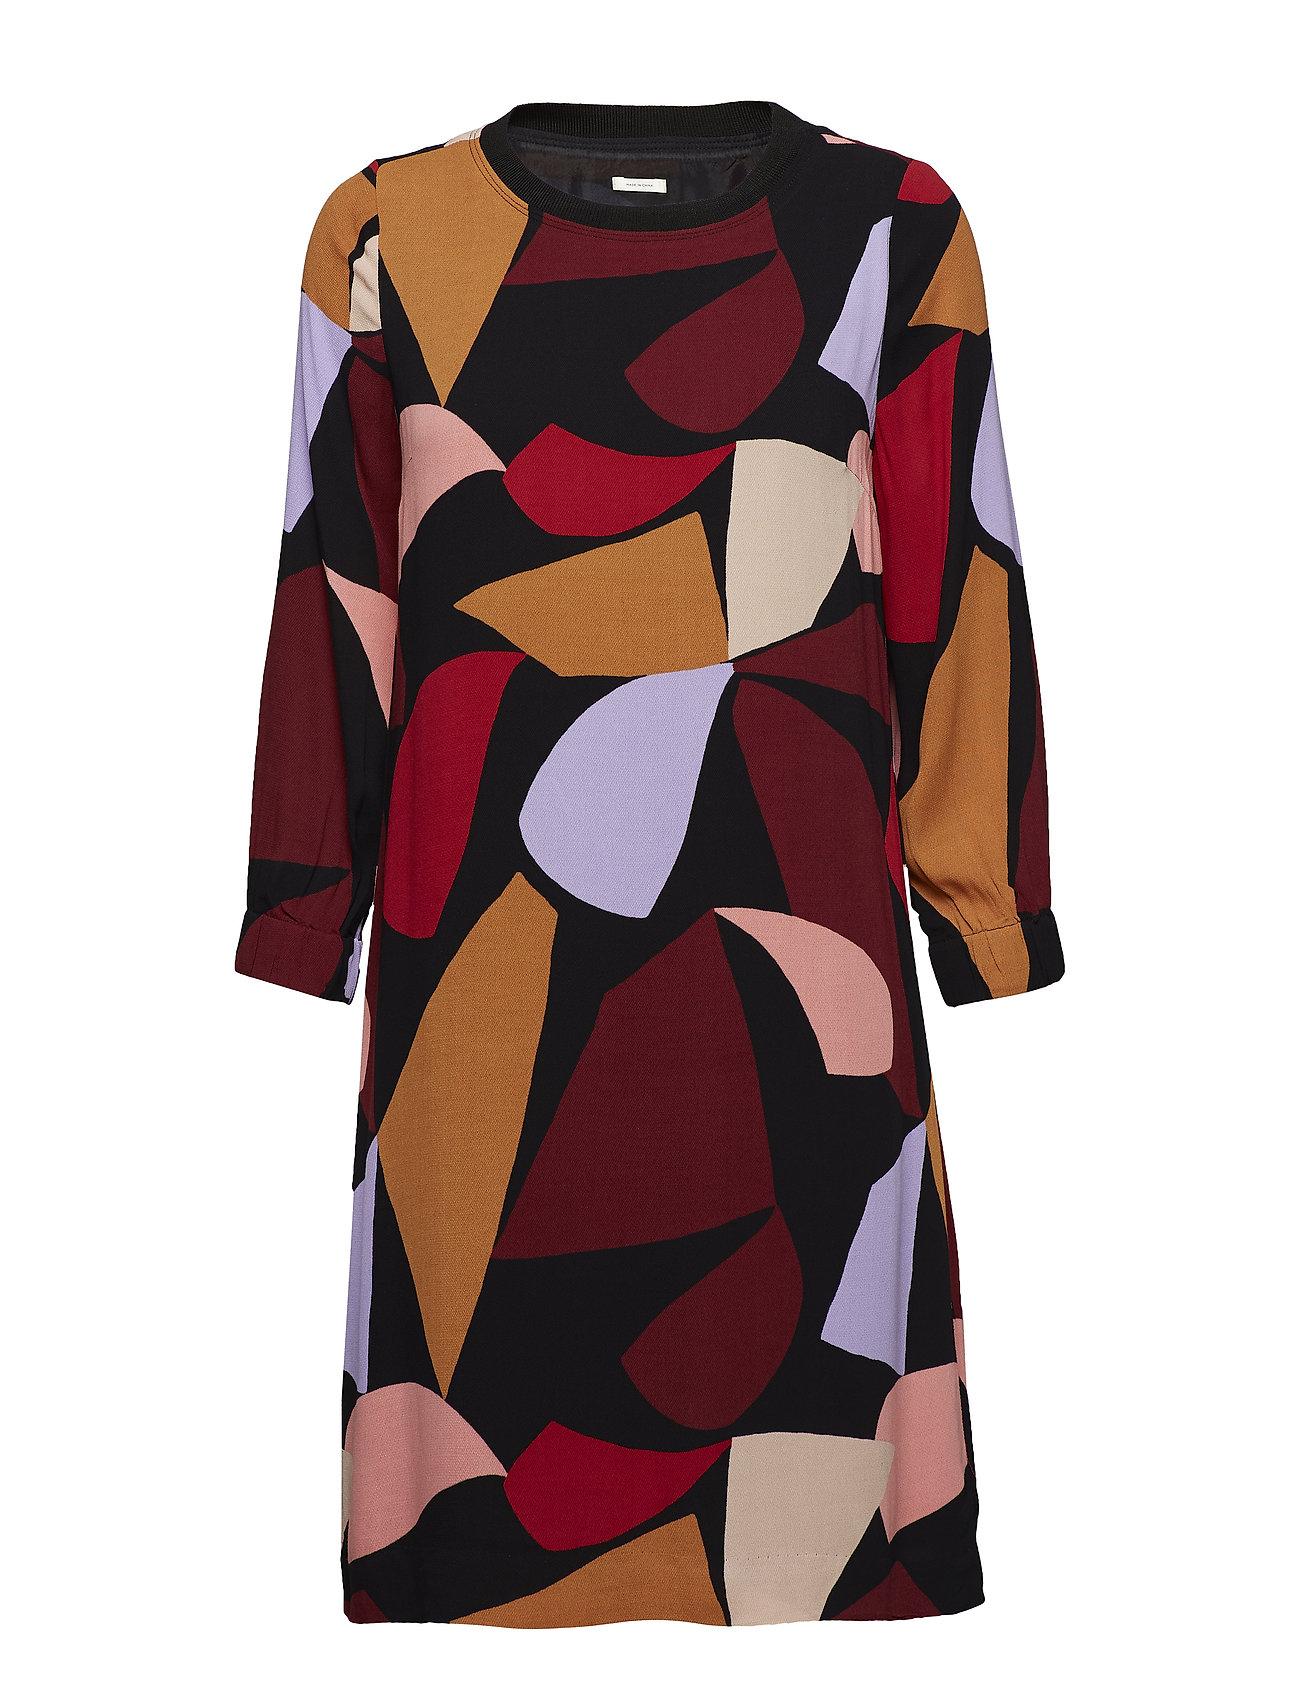 Image of Vexi Short Dress Lw Knælang Kjole Sort INWEAR (3072430057)